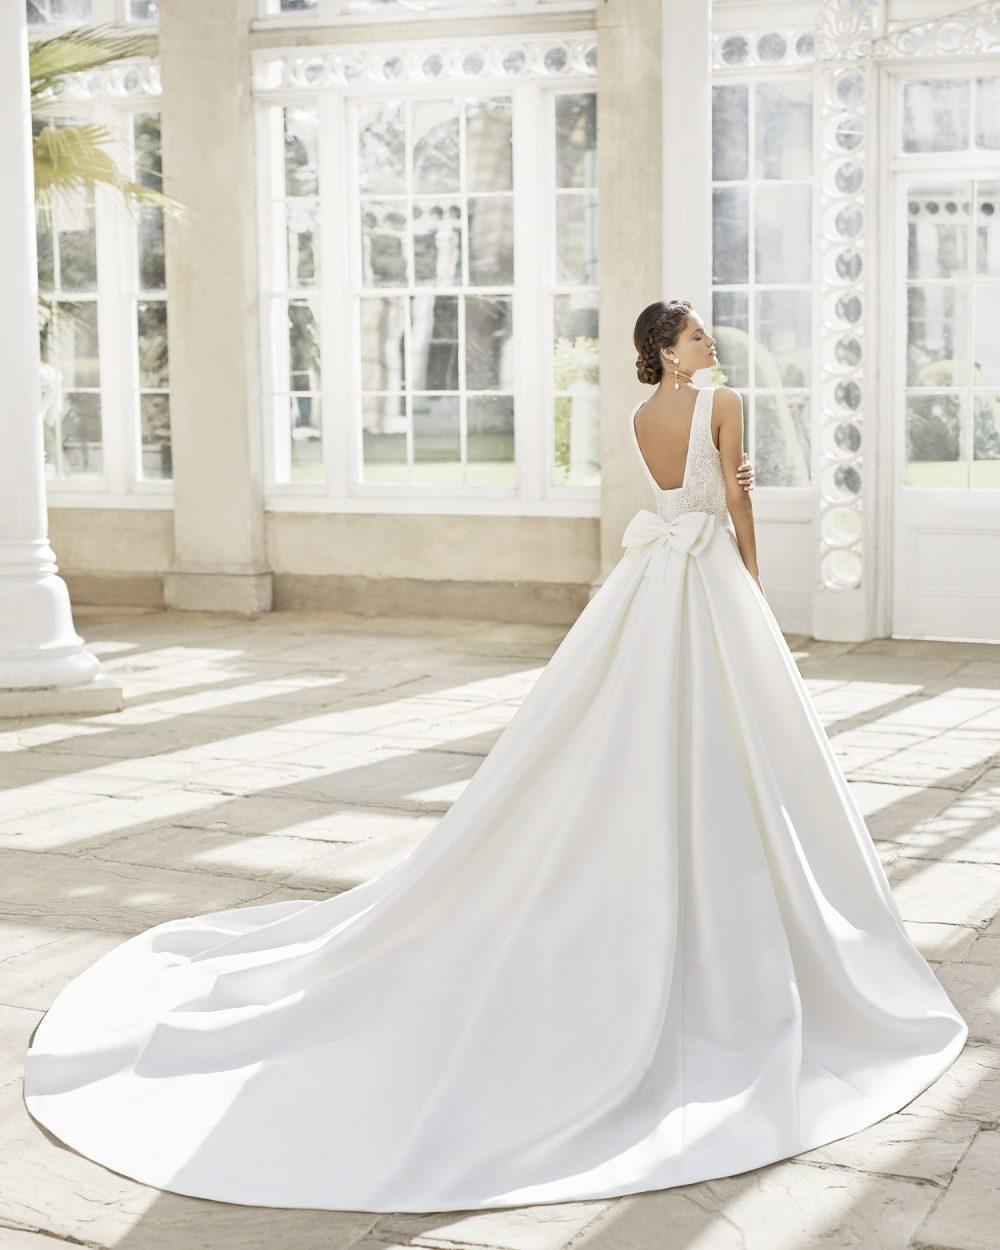 Mariages: abito da sposa Rosa Clarà 2021 a Vicenza, Verona, Padova, Veneto 5A173 TOM